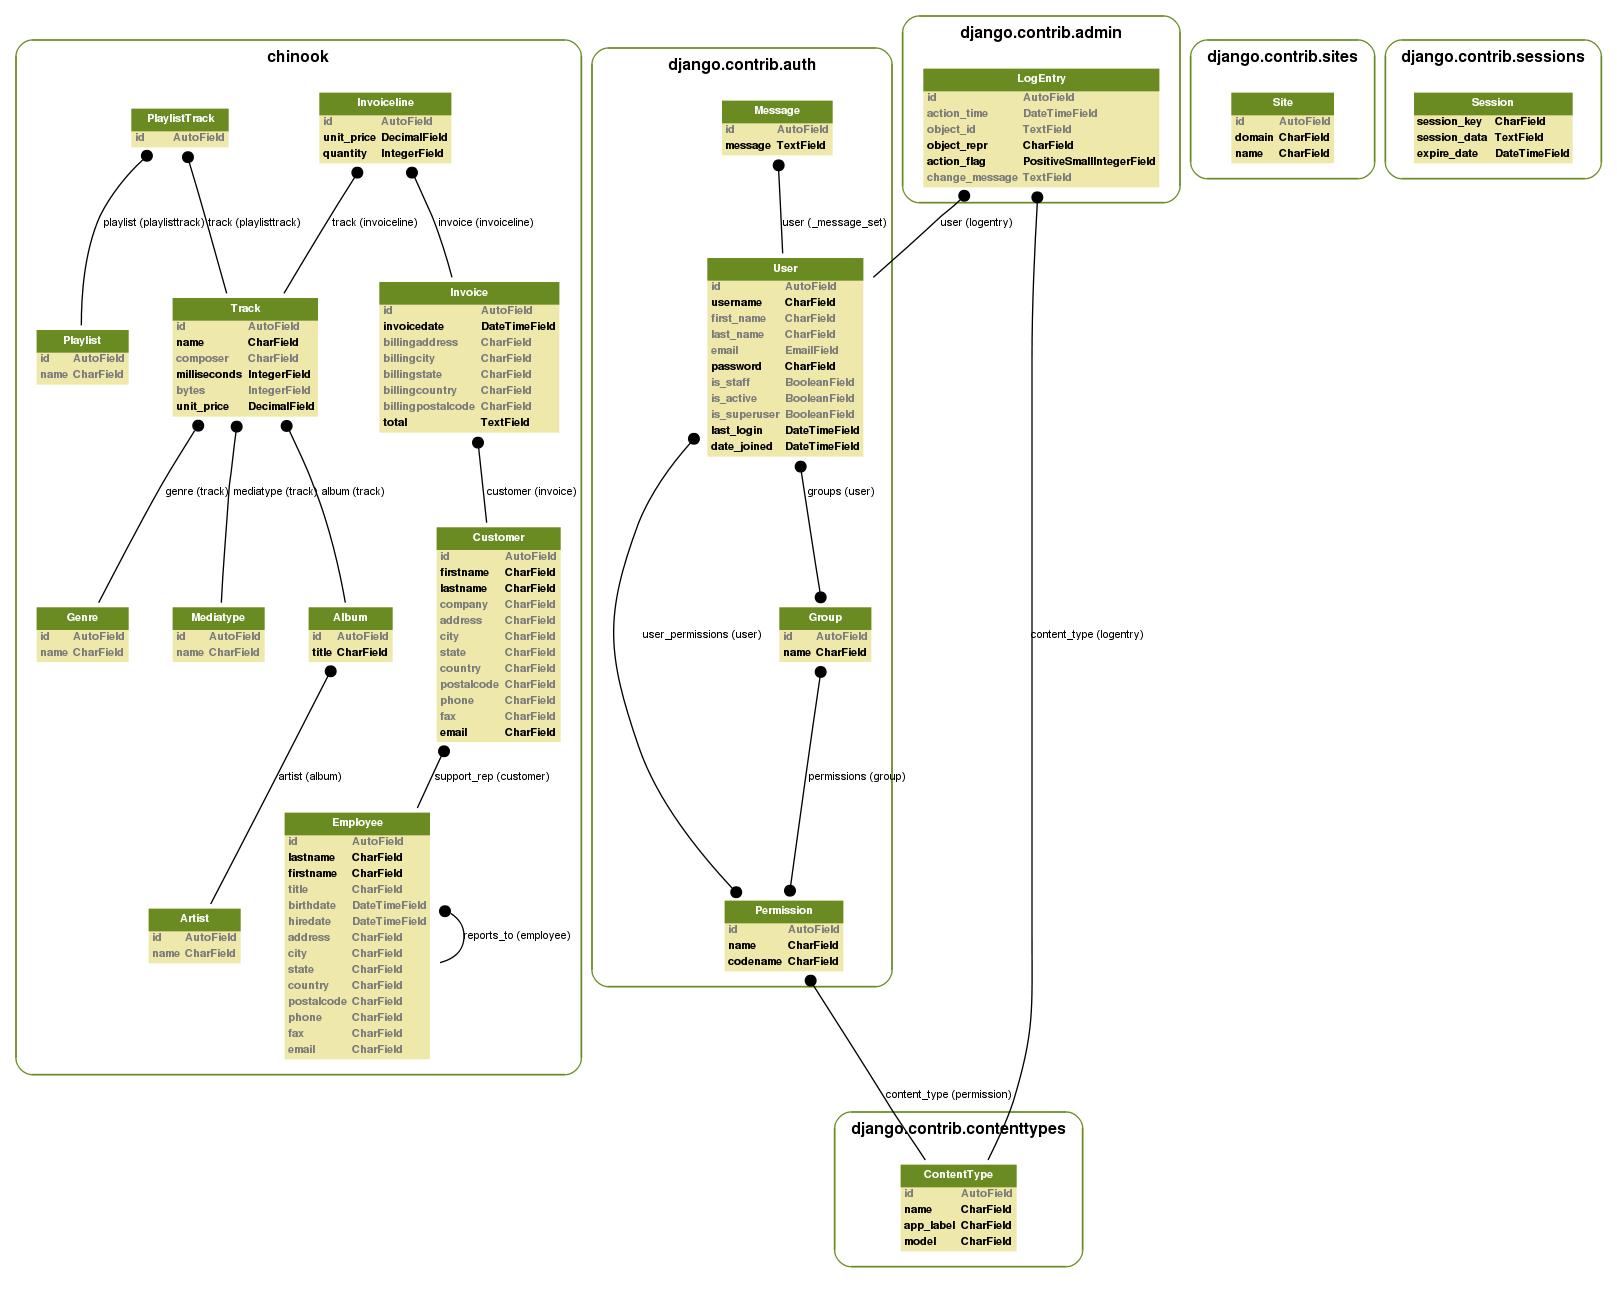 Tutorial: Using Django's Multiple Database Support